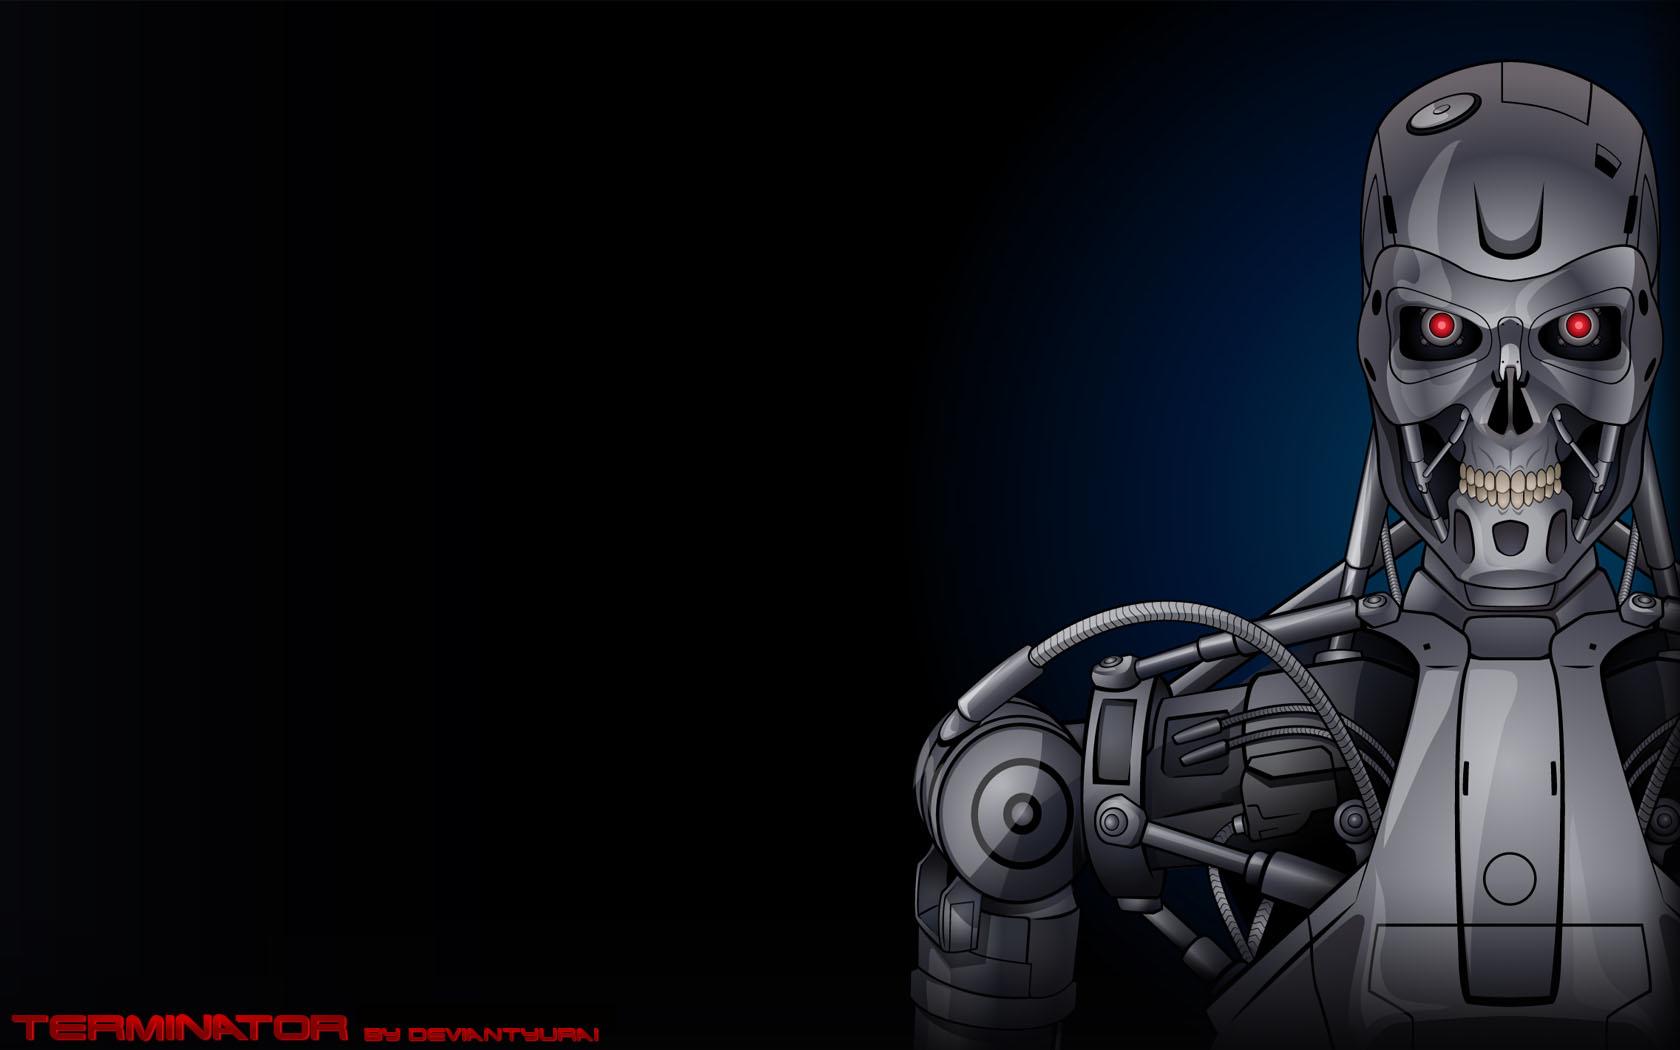 Terminator Wallpaper by YulayDevlet on